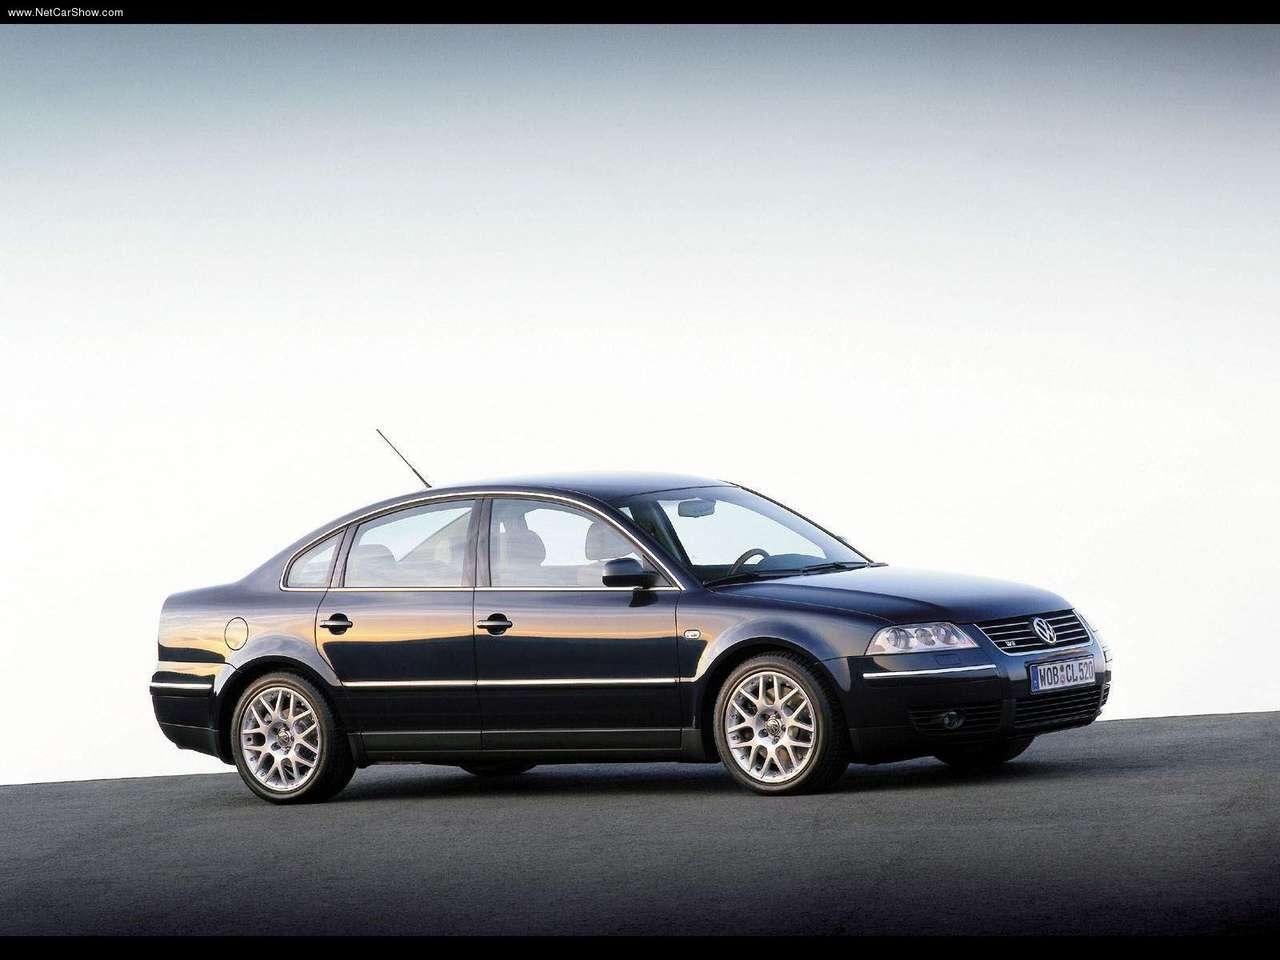 http://4.bp.blogspot.com/-UyjzOvGvGQY/TXs6baj1IsI/AAAAAAAANN4/yLL4E29ci8I/s1600/Volkswagen-Passat_W8_2001_1280x960_wallpaper_01.jpg